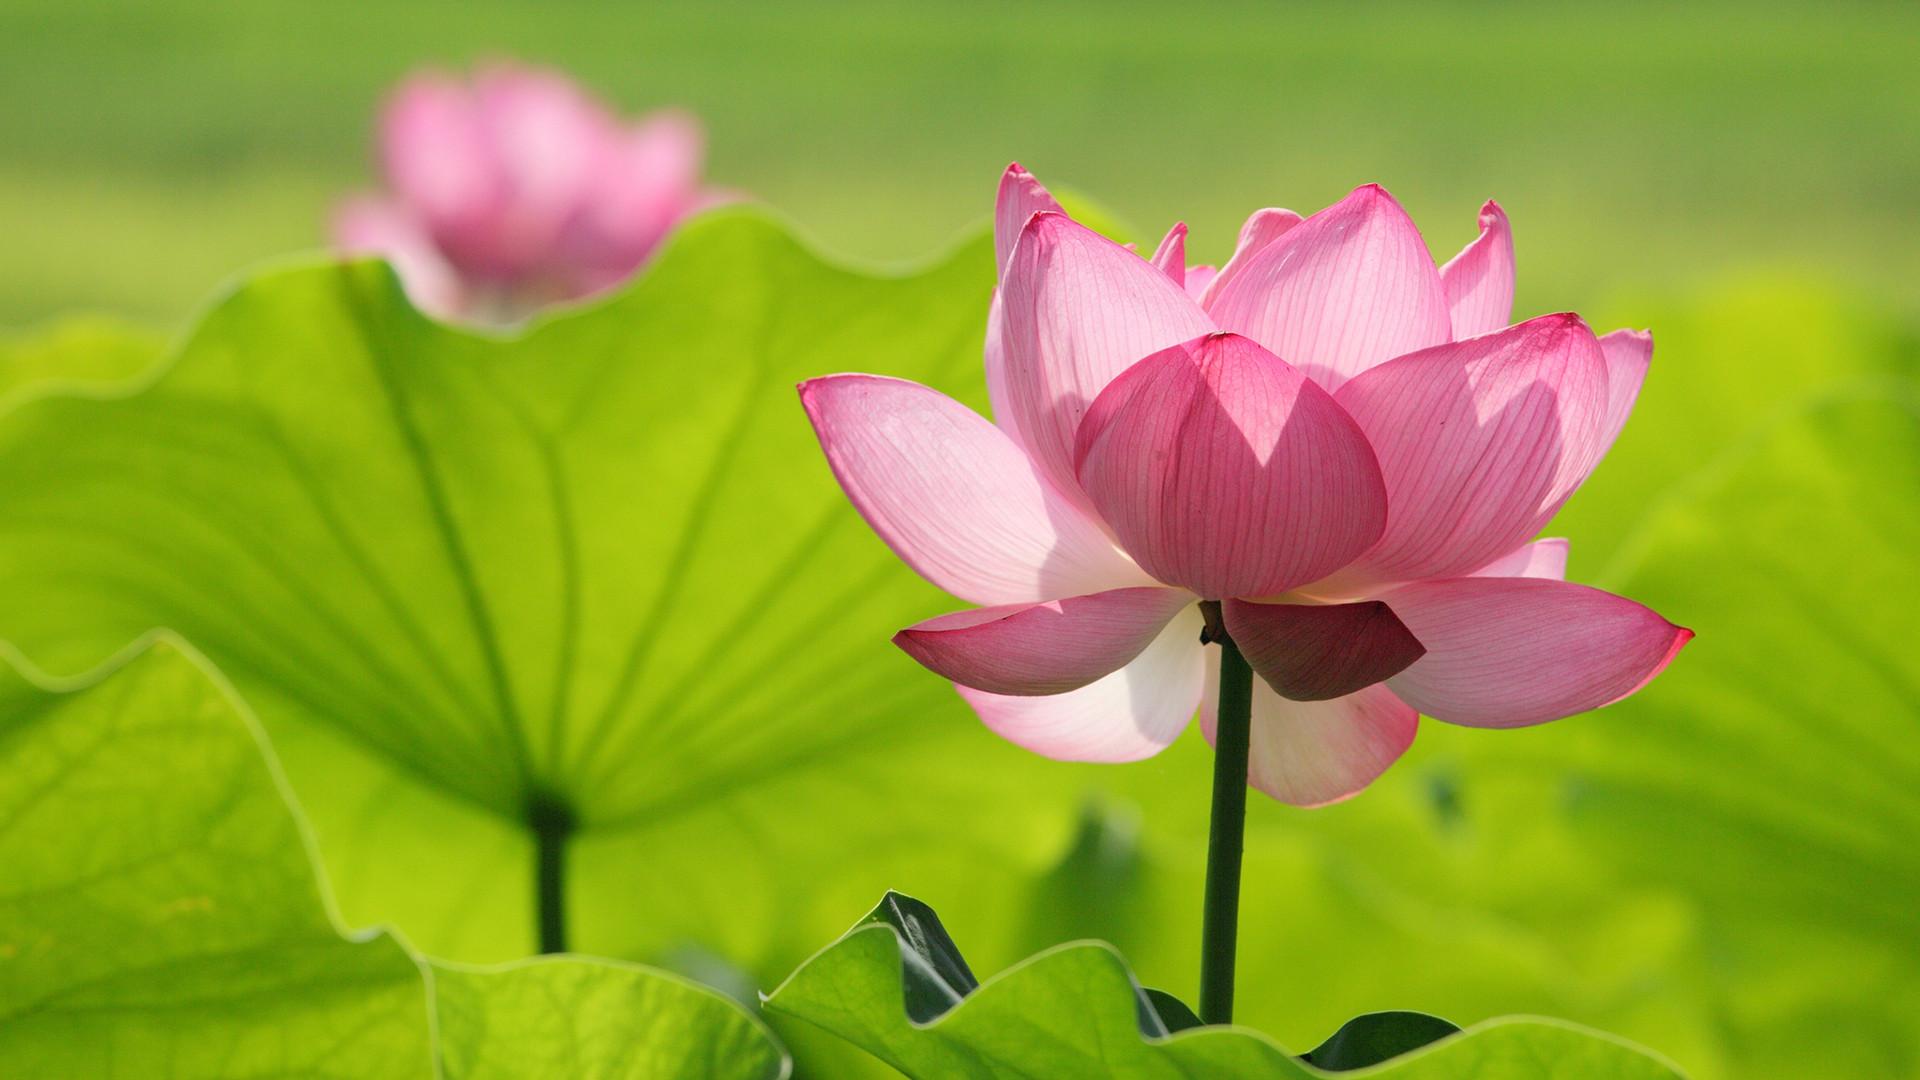 Lotus Flower Background Tattoo Flowers Healthy